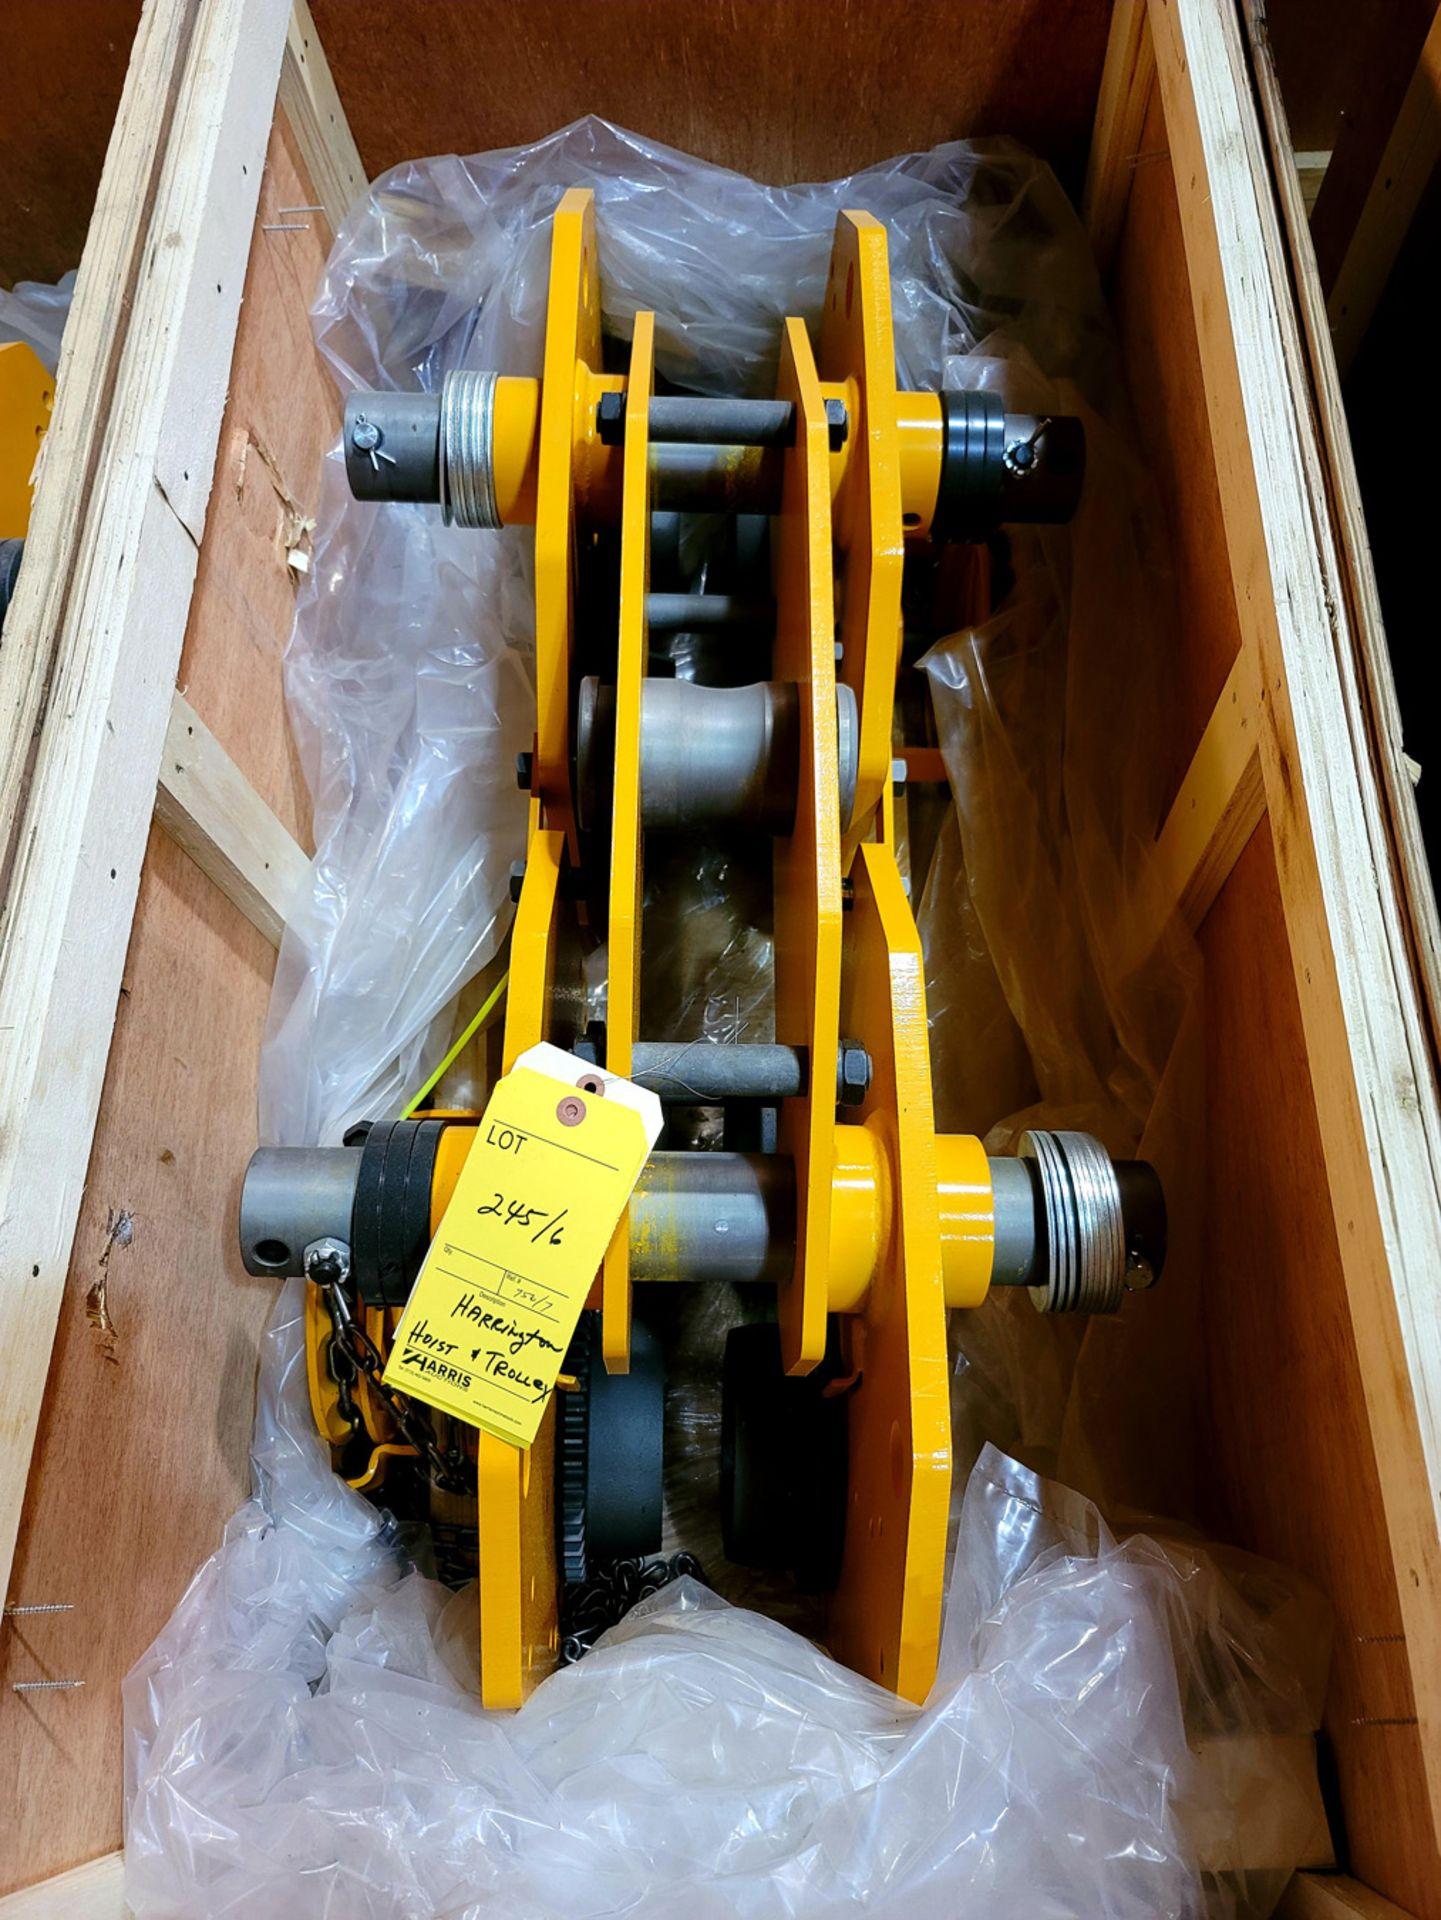 Harrington Hoist & Trolley, NEW in Crate - Image 2 of 2